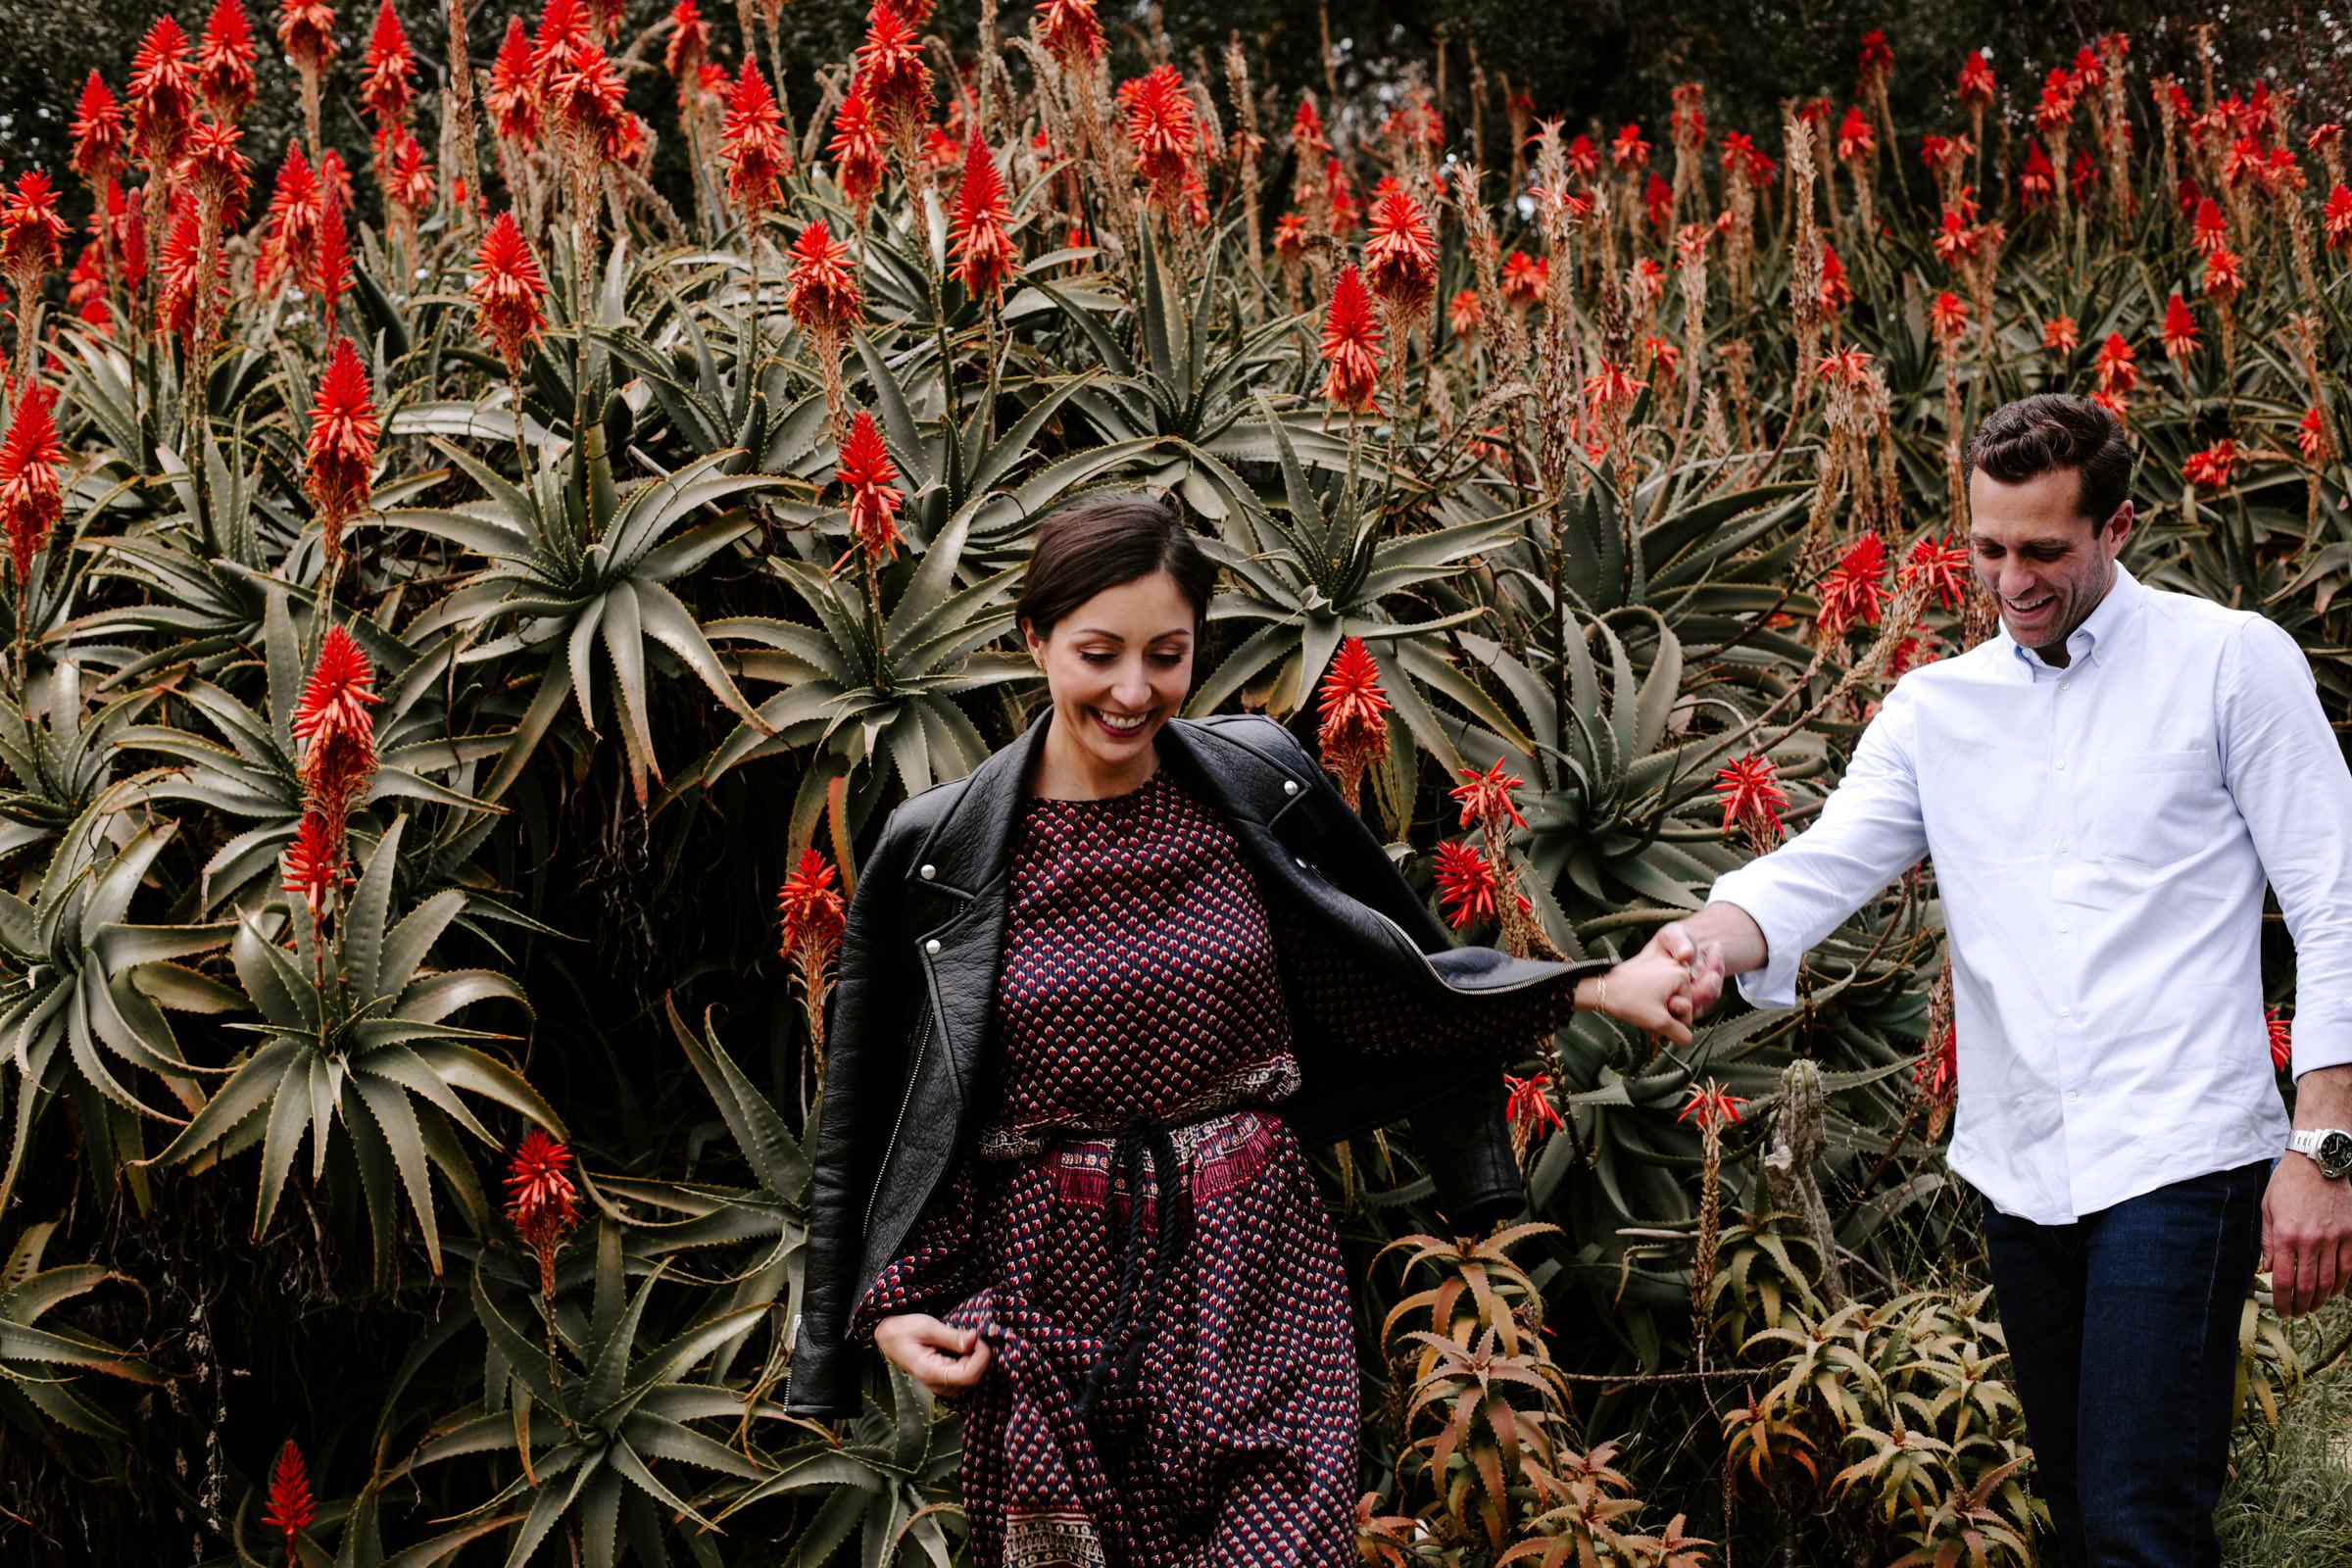 San-Francisco-Photographer-Pierce-Weddings-110.jpg